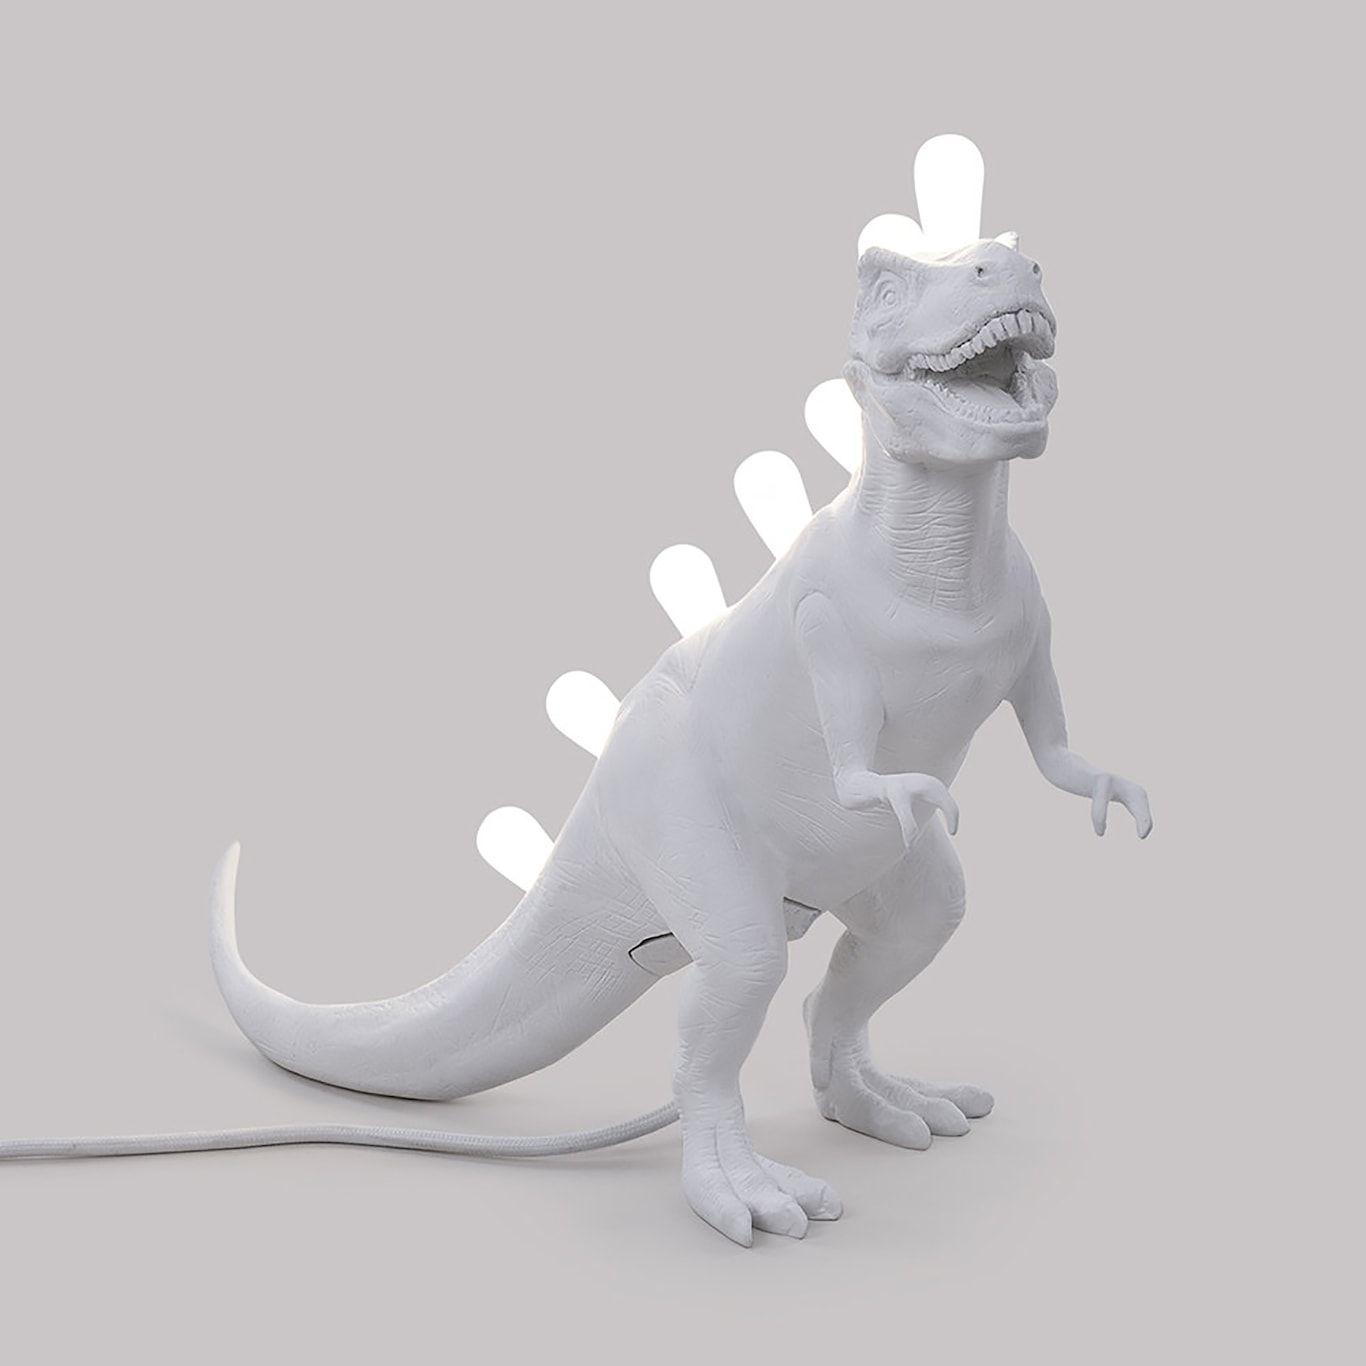 Jurassic Lampe Rex Hvit Seletti Royaldesign No Dinosaur Design Lamper